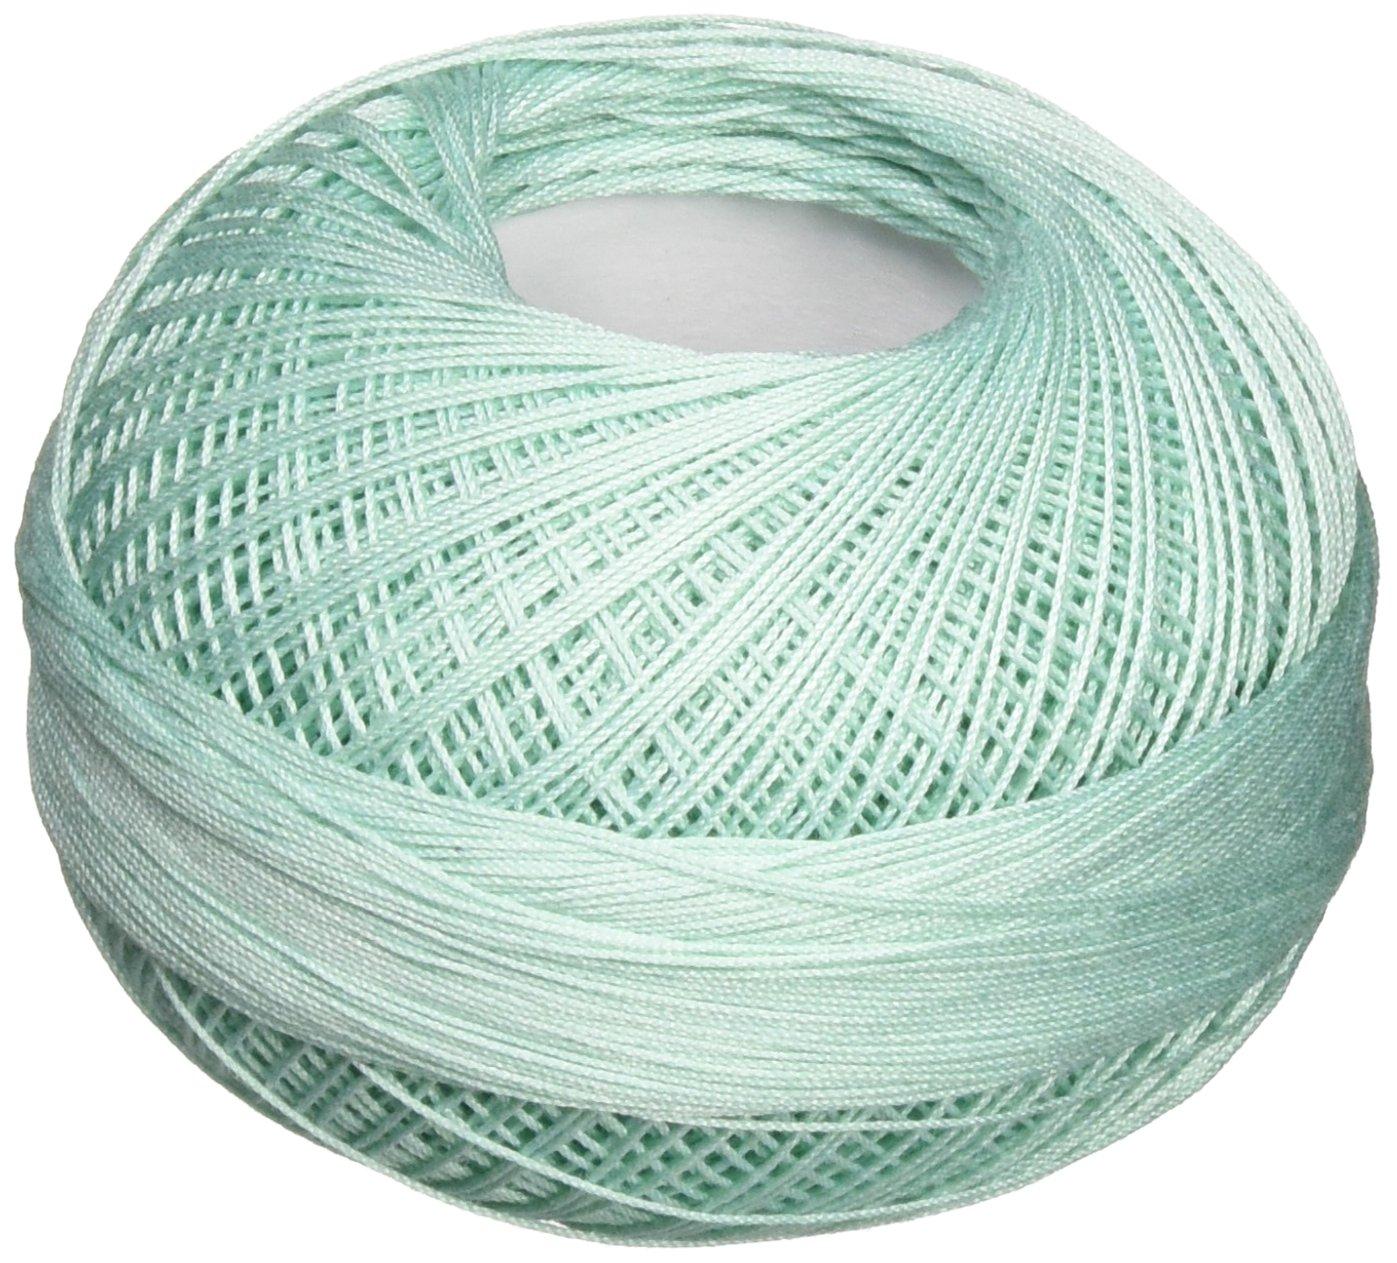 Handy Hands Lizbeth Premium Cotton Thread, Size 40, Seagreen Light Inc. HH40686